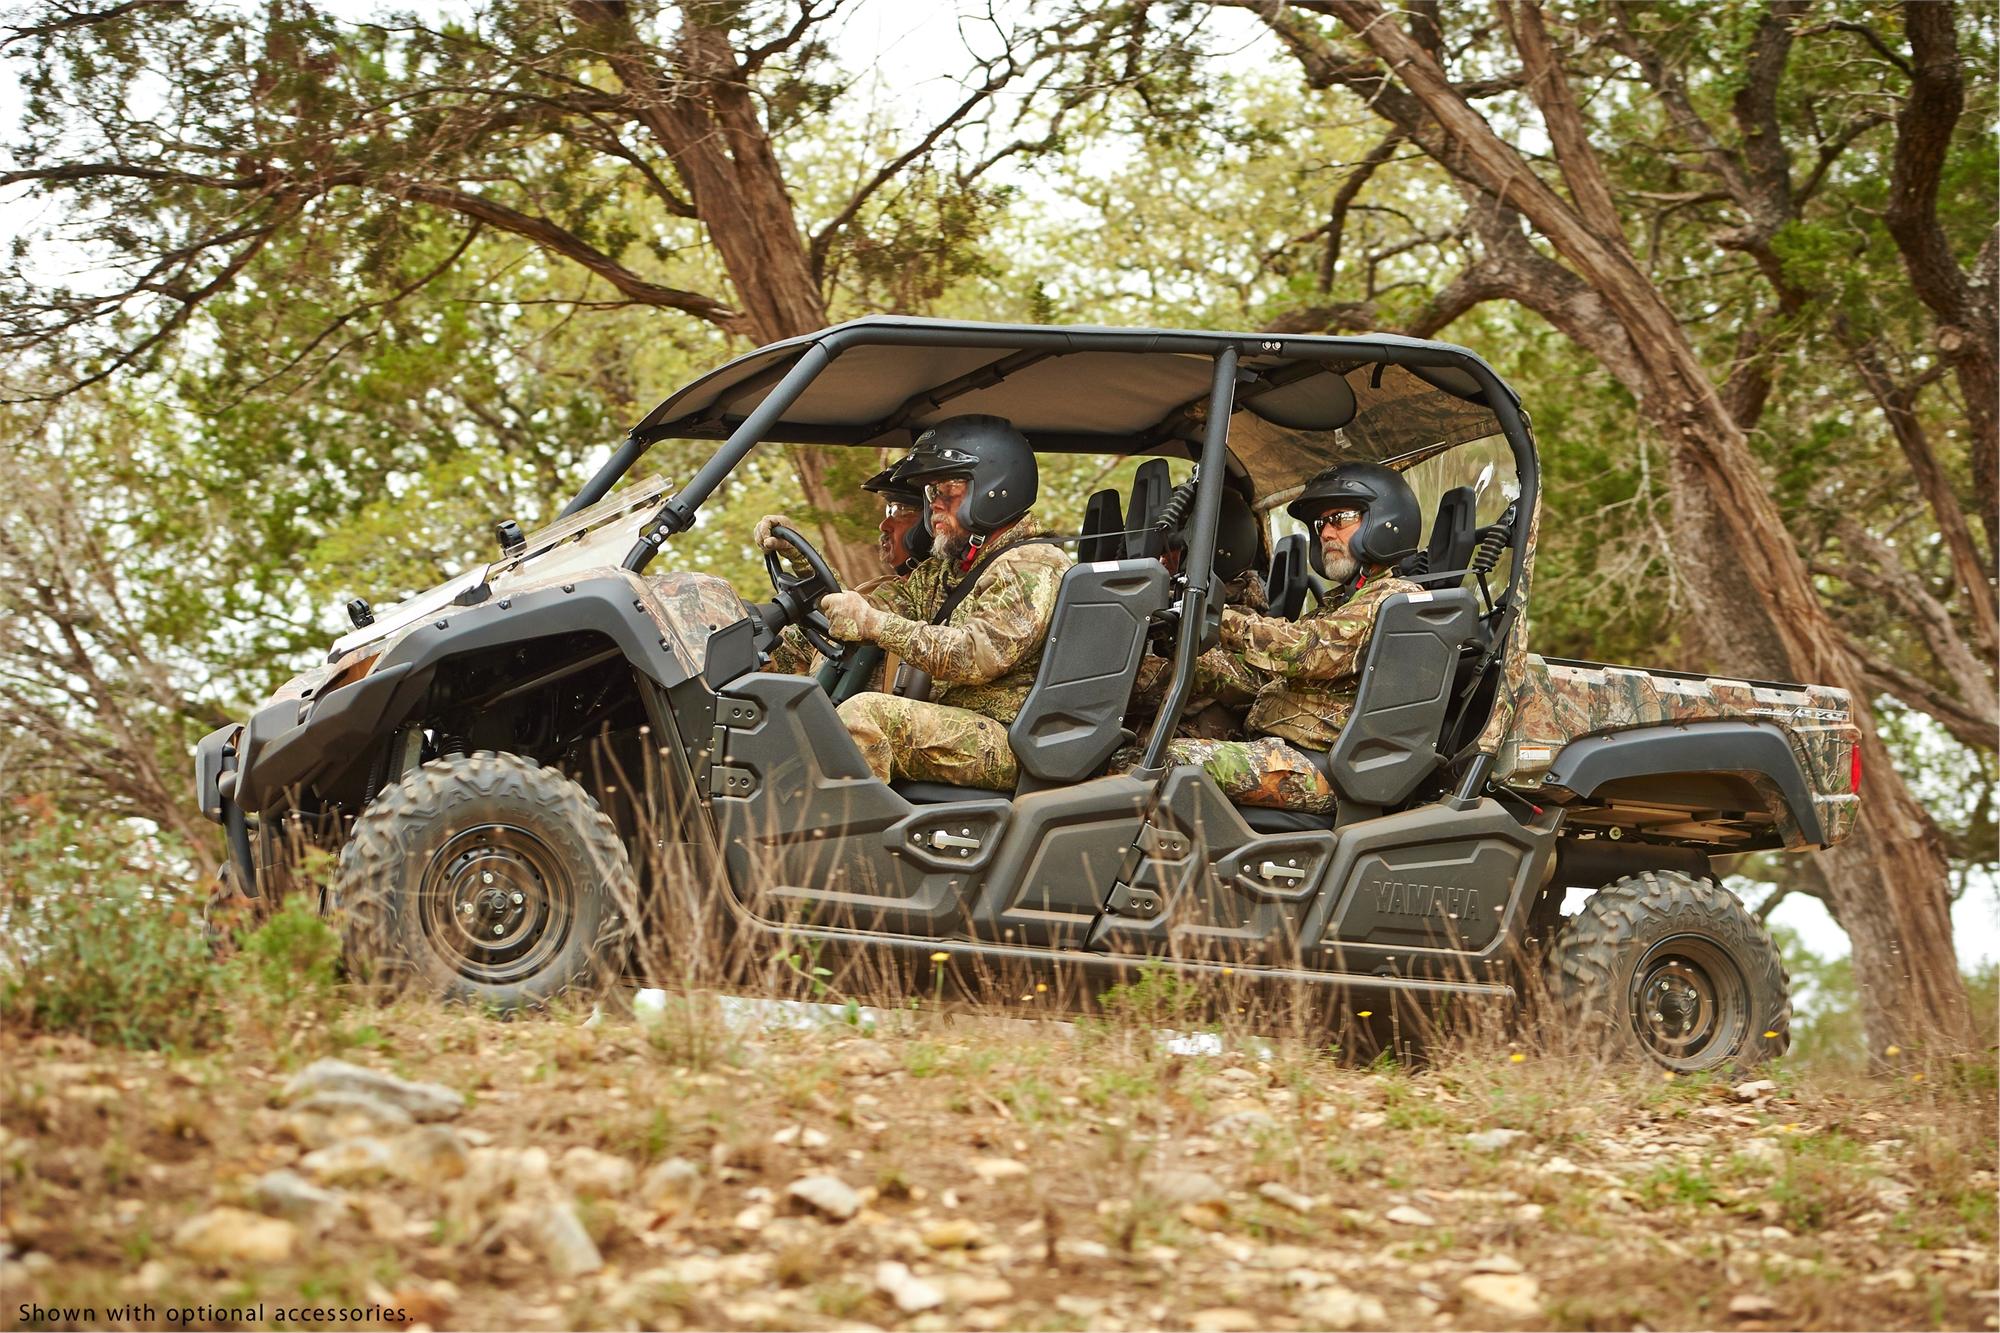 Yamaha Shows the 2014 Viking VI 6-Seater SxS - autoevolution